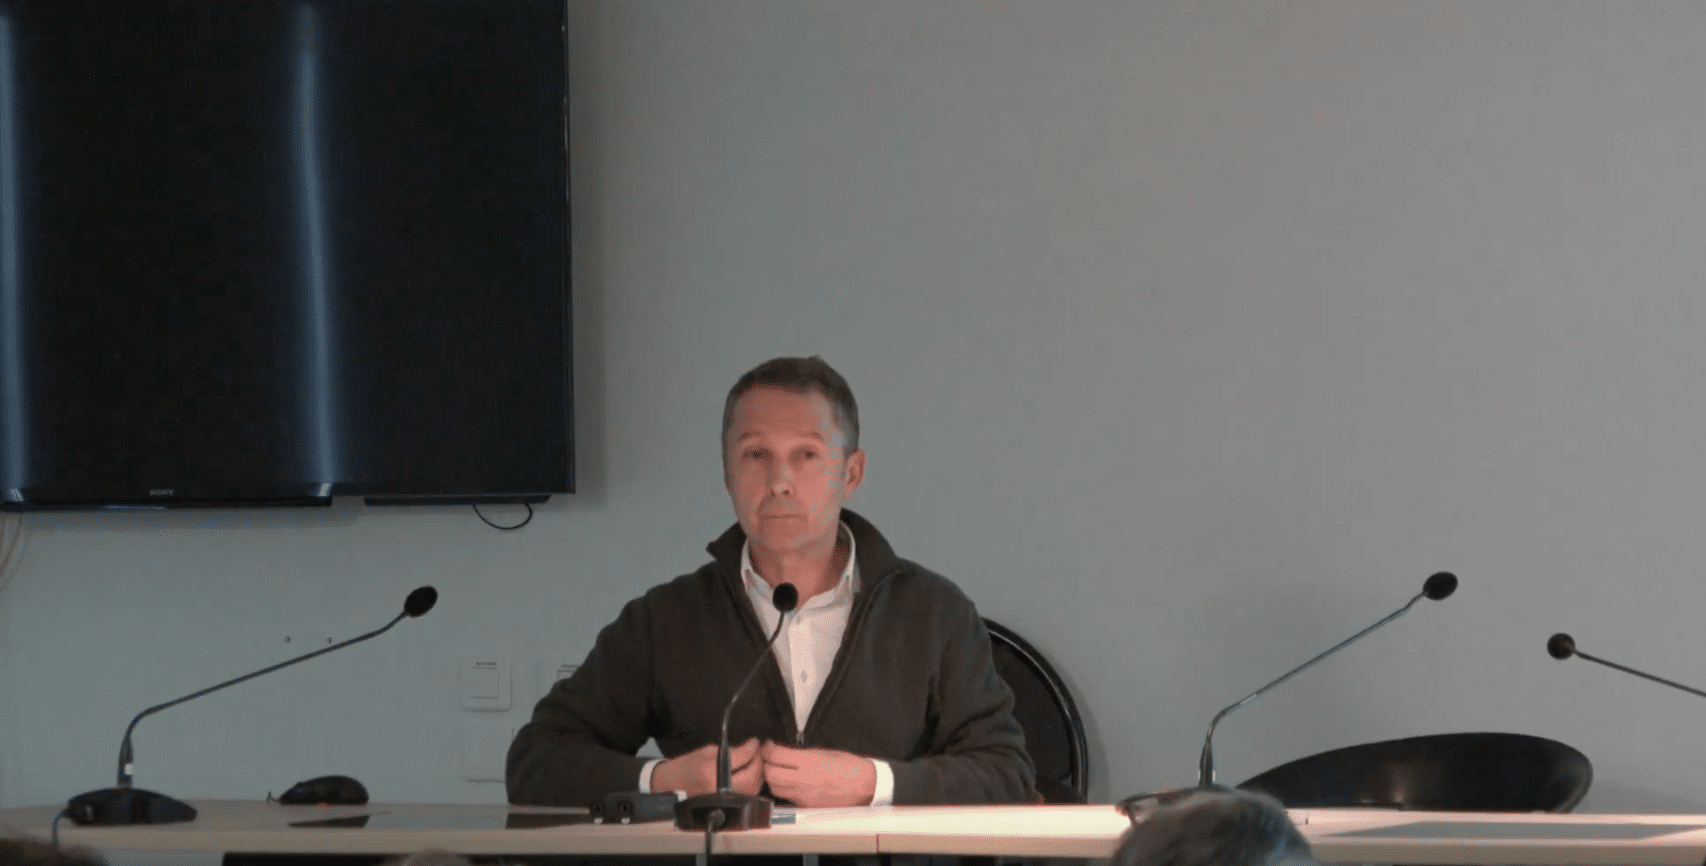 Sujet sociétal et sujet malade – Philippe Nuss